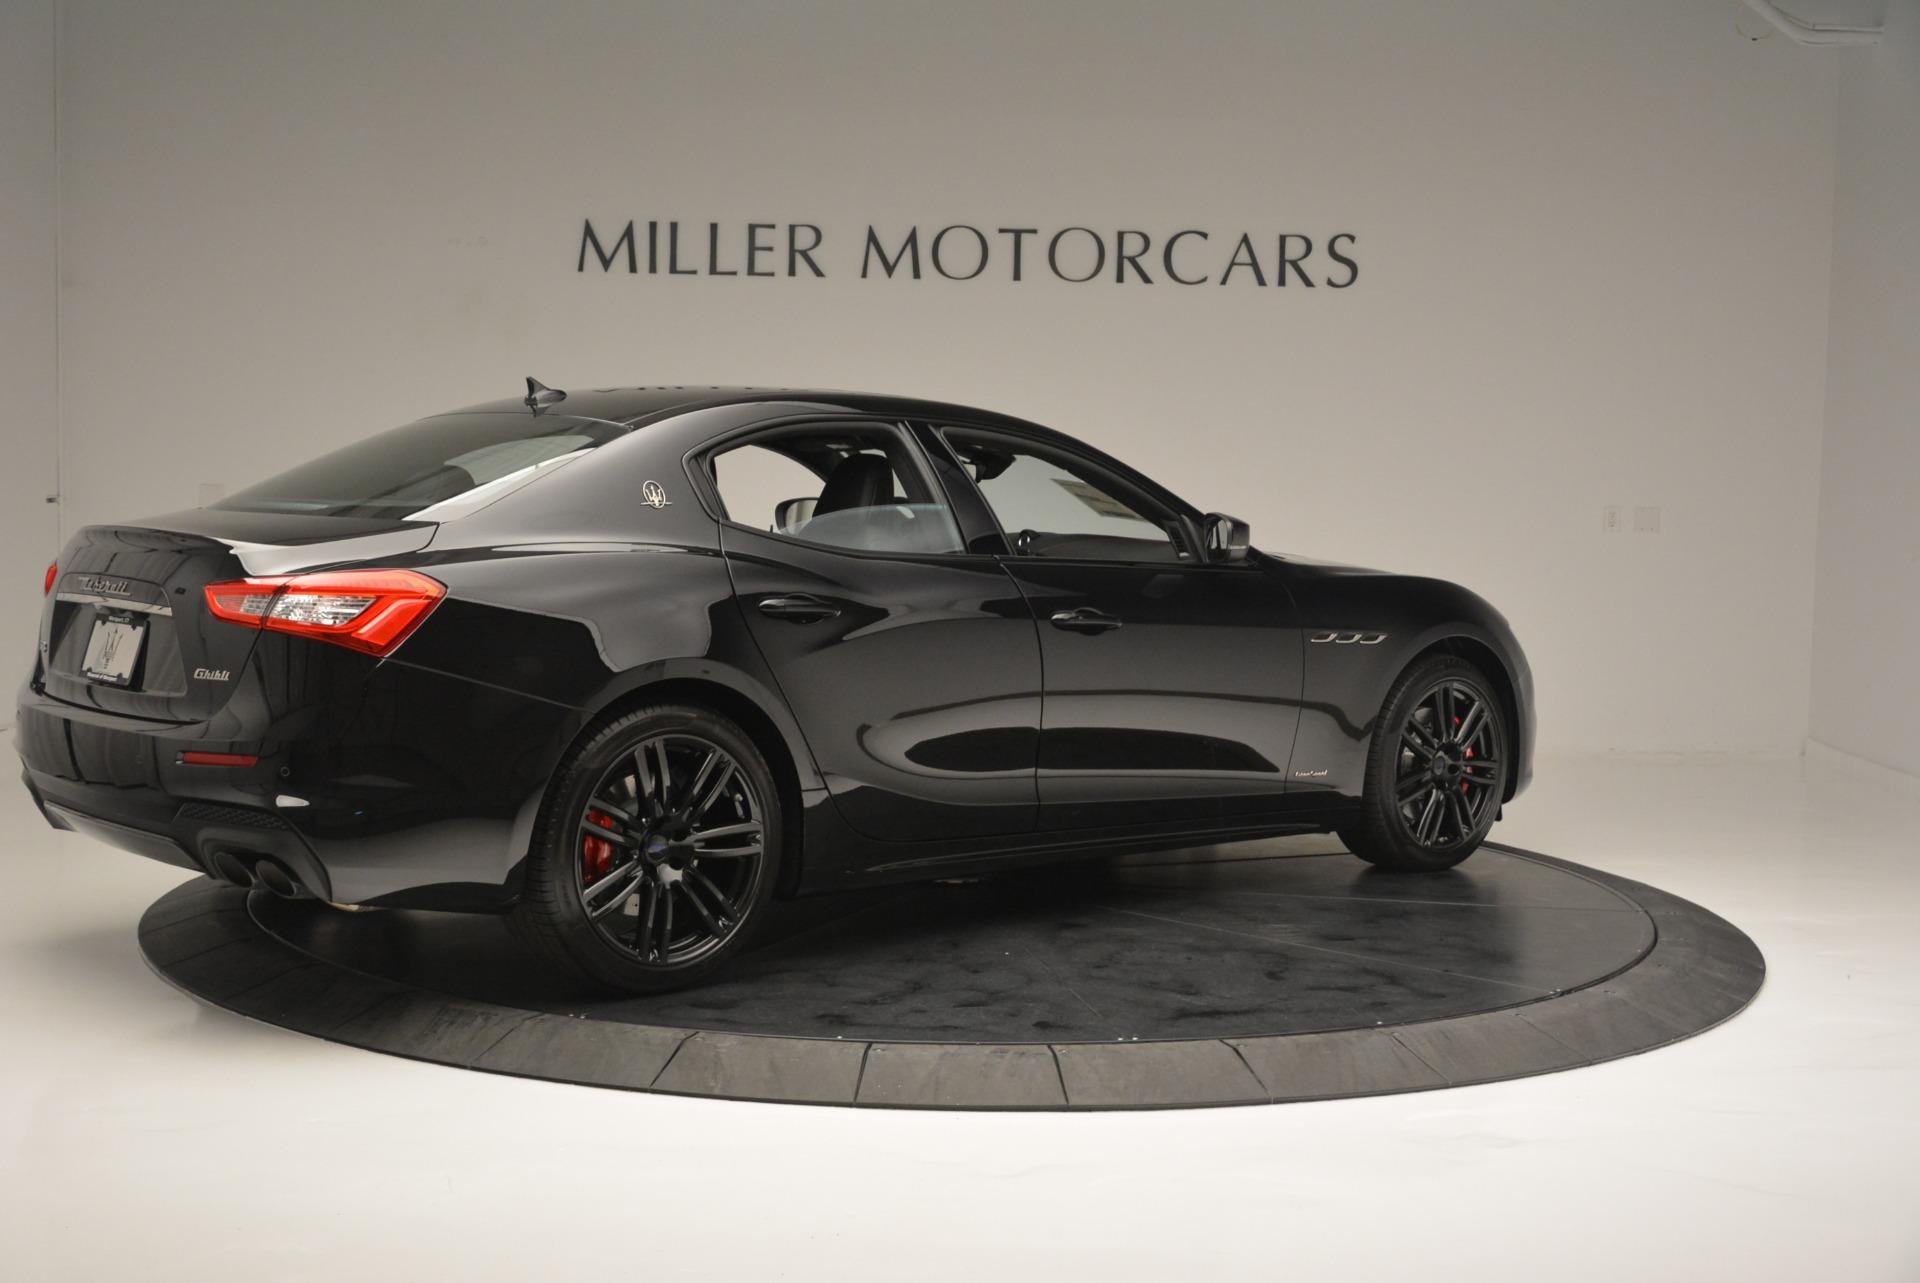 New 2018 Maserati Ghibli SQ4 GranSport Nerissimo For Sale In Westport, CT 2366_p8